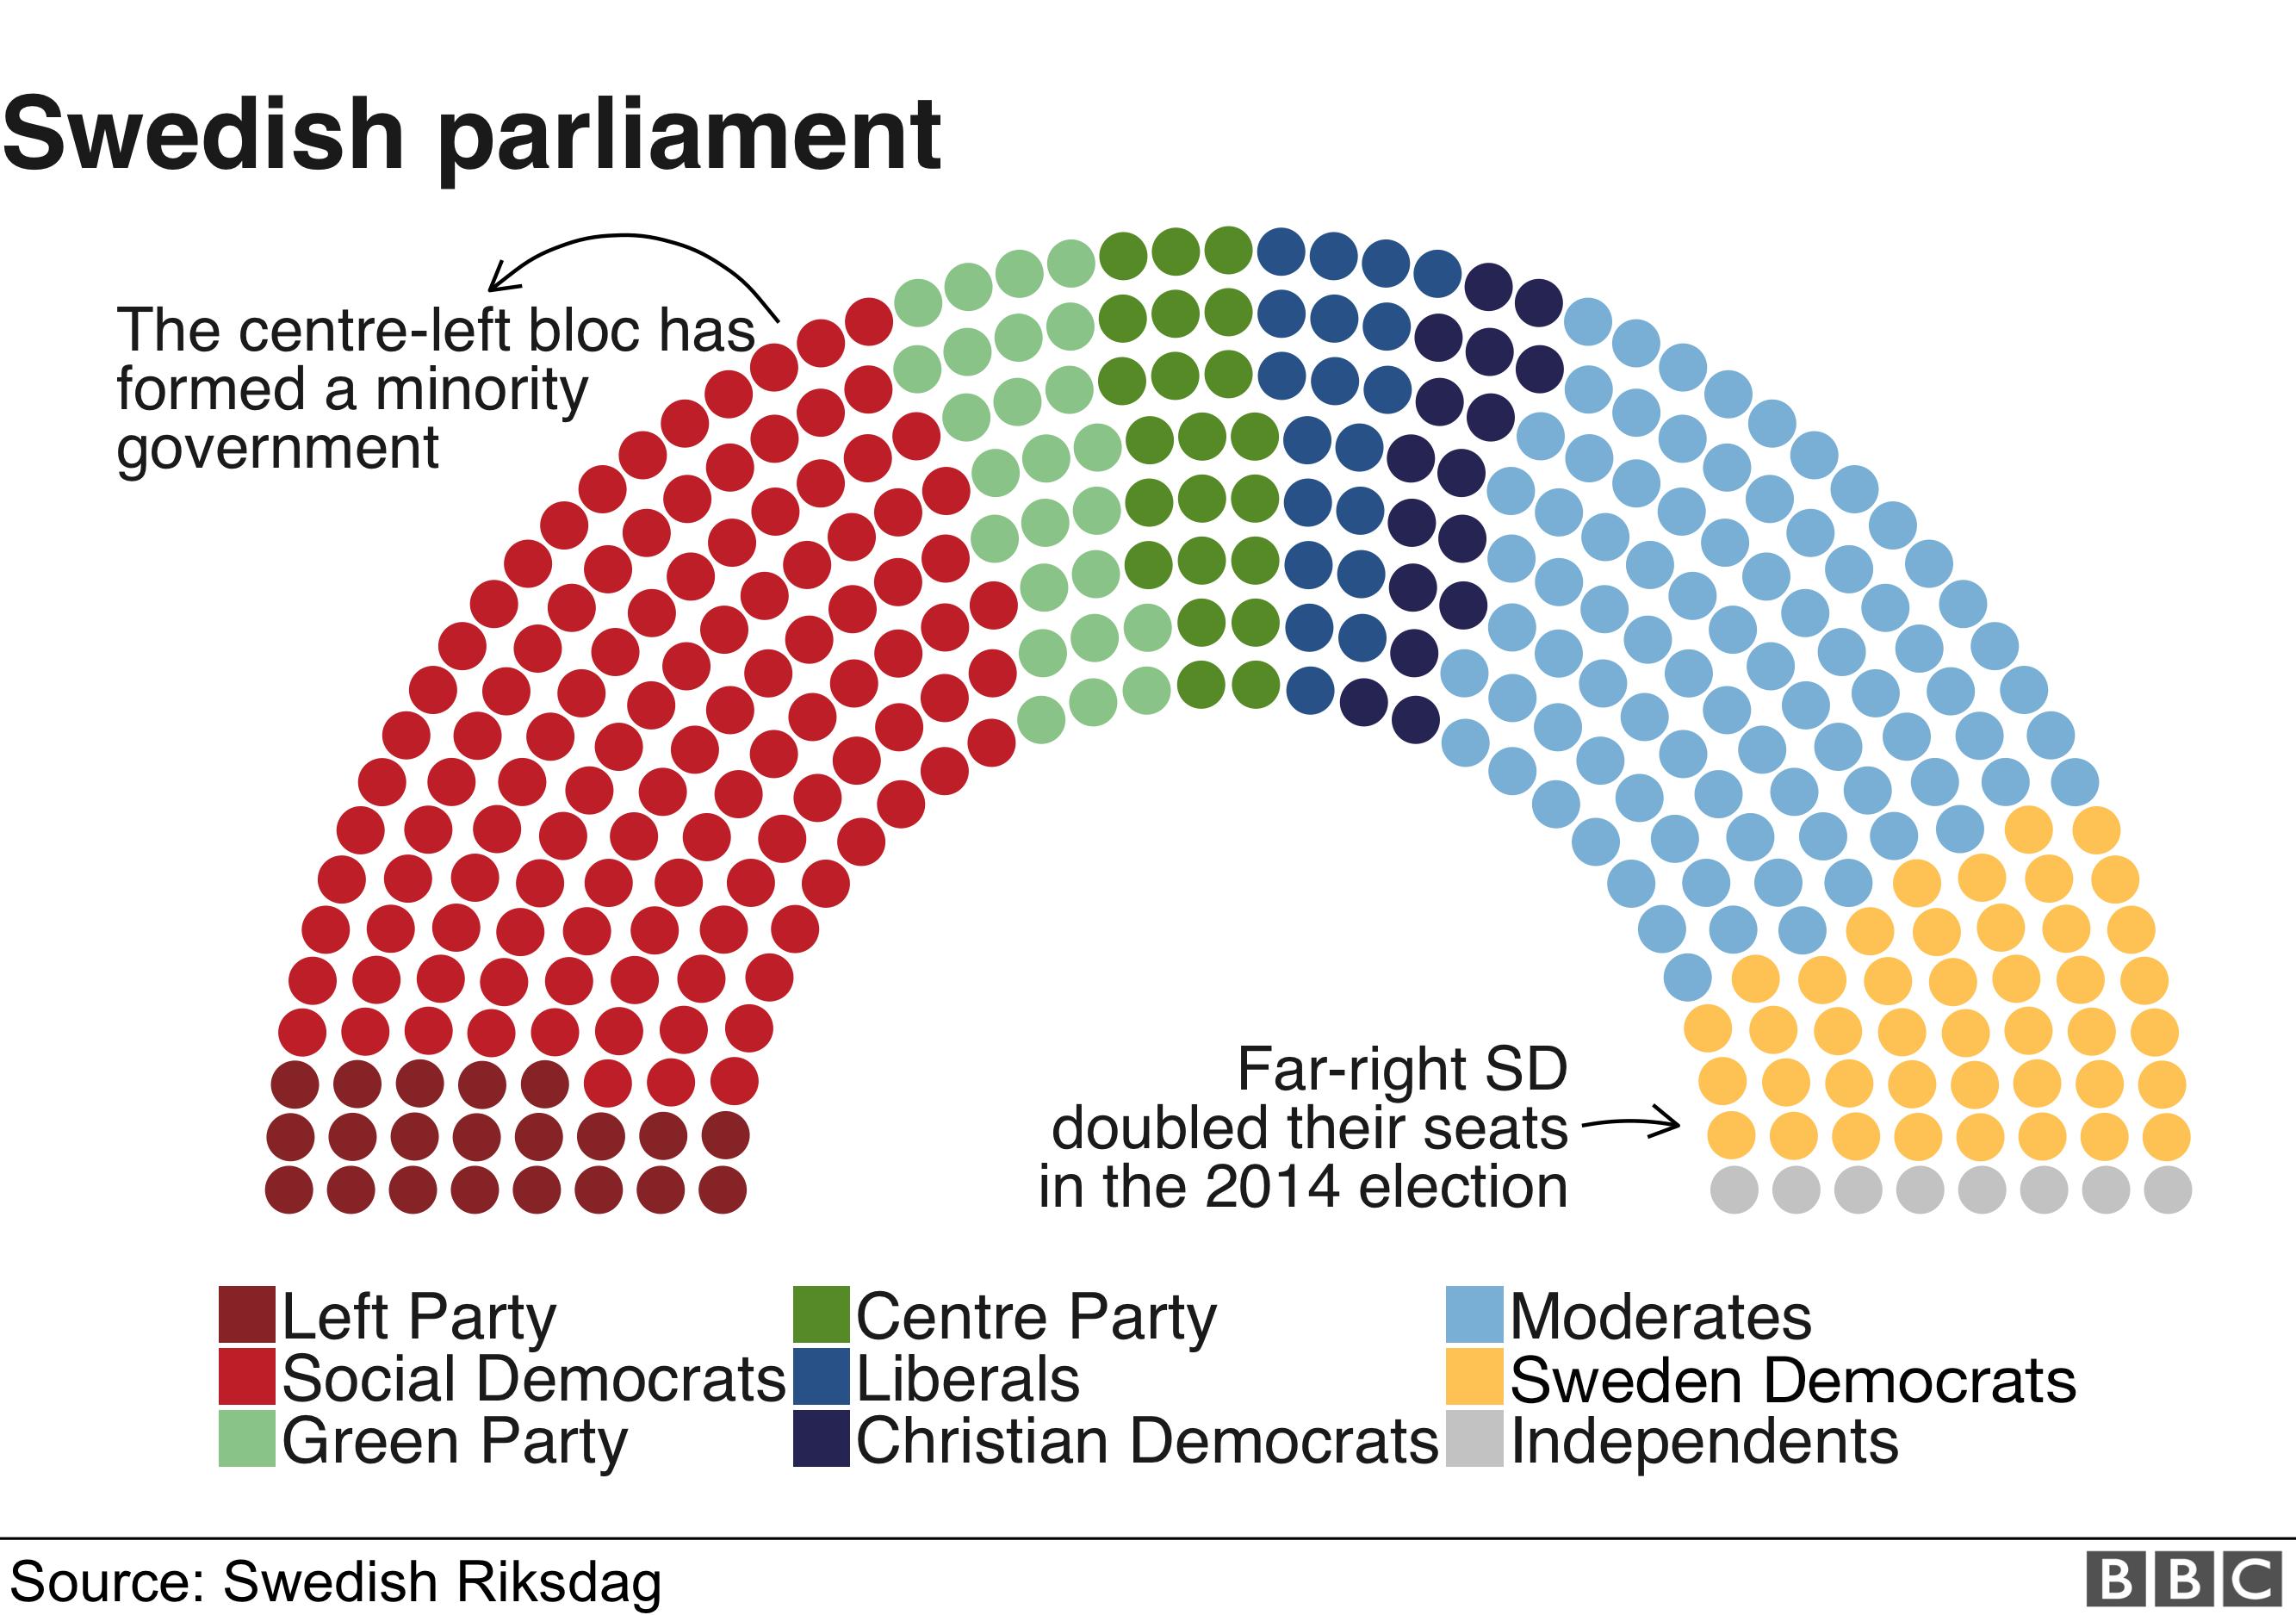 Sweden's parliament